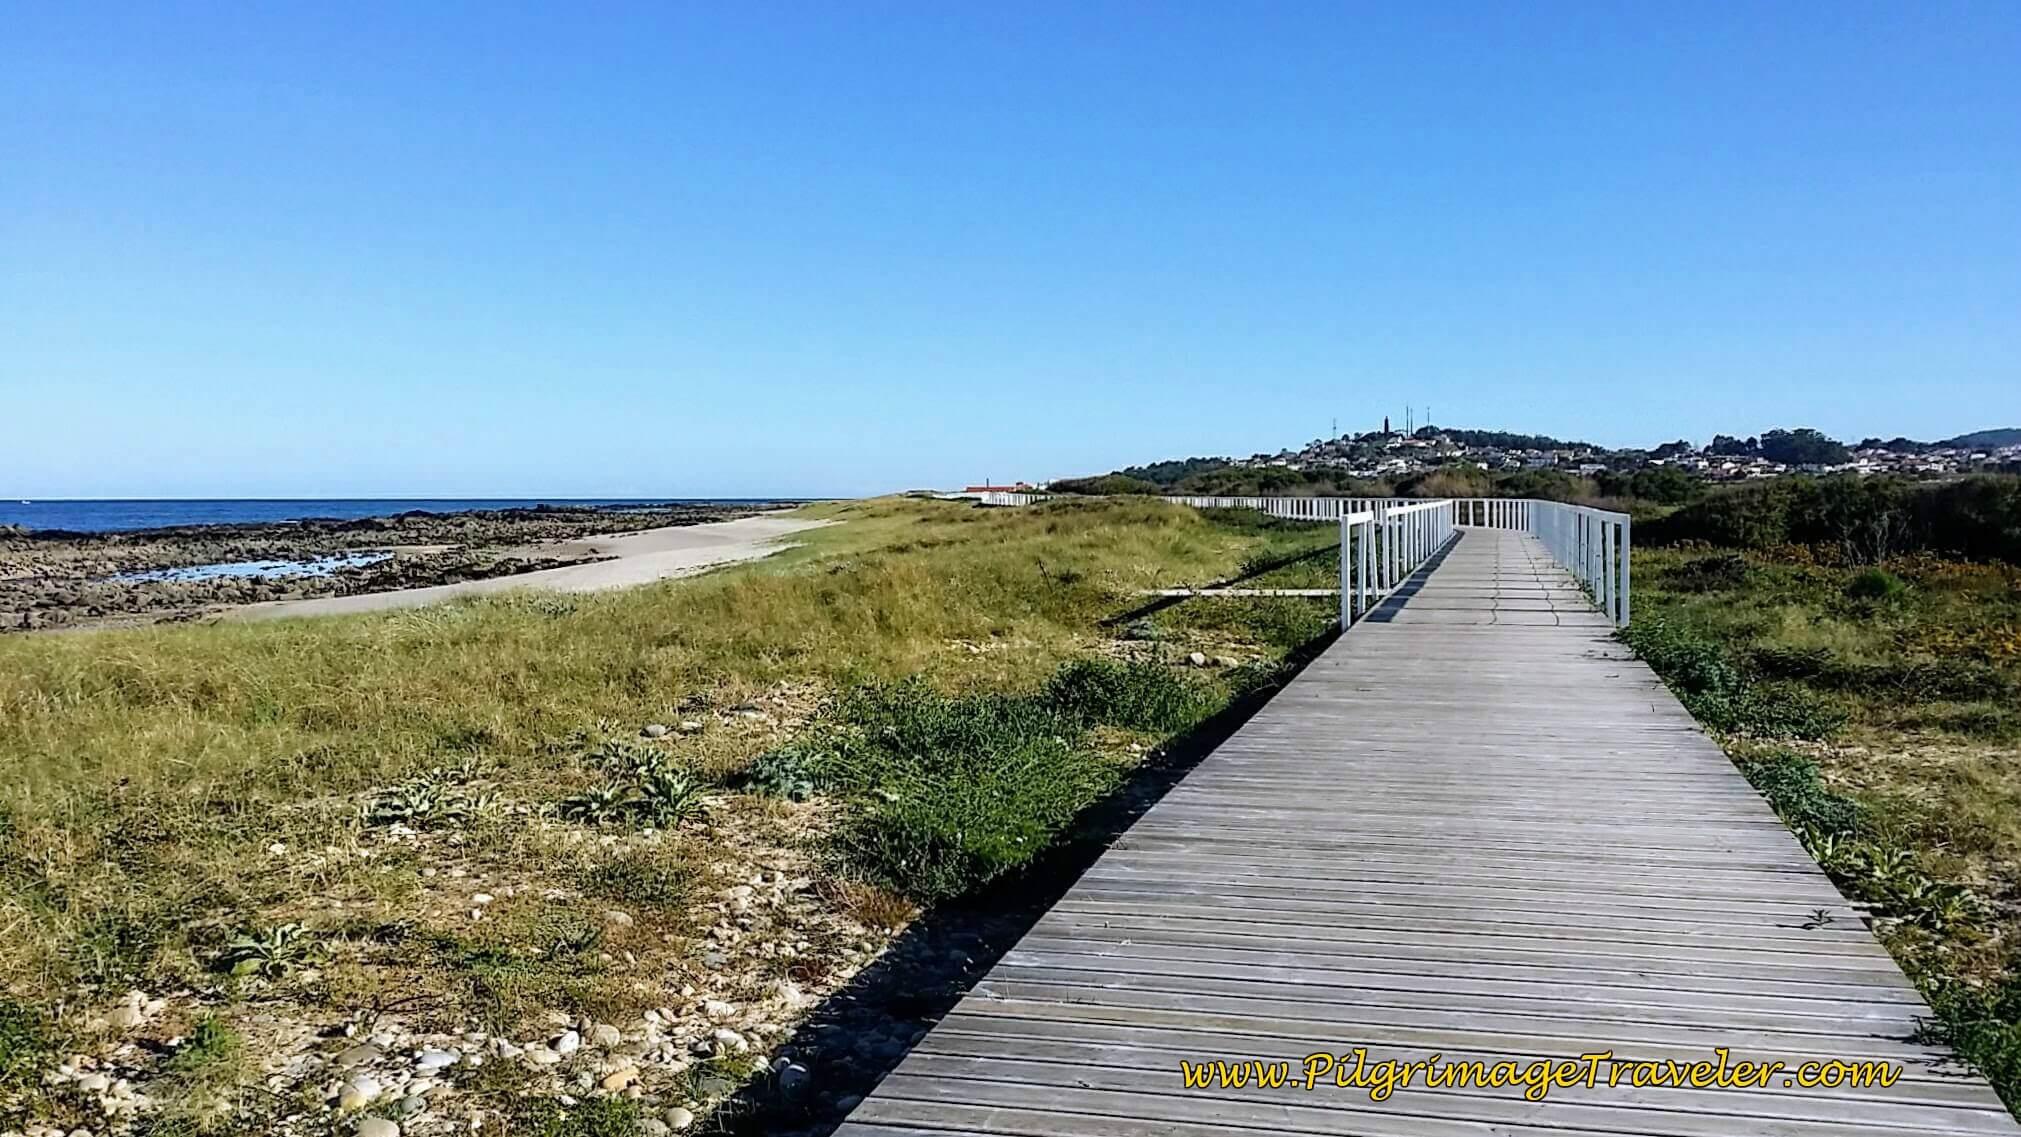 Boardwalk to Praia do Canto Marinho on day eighteen of the Camino Portugués on the Senda Litoral